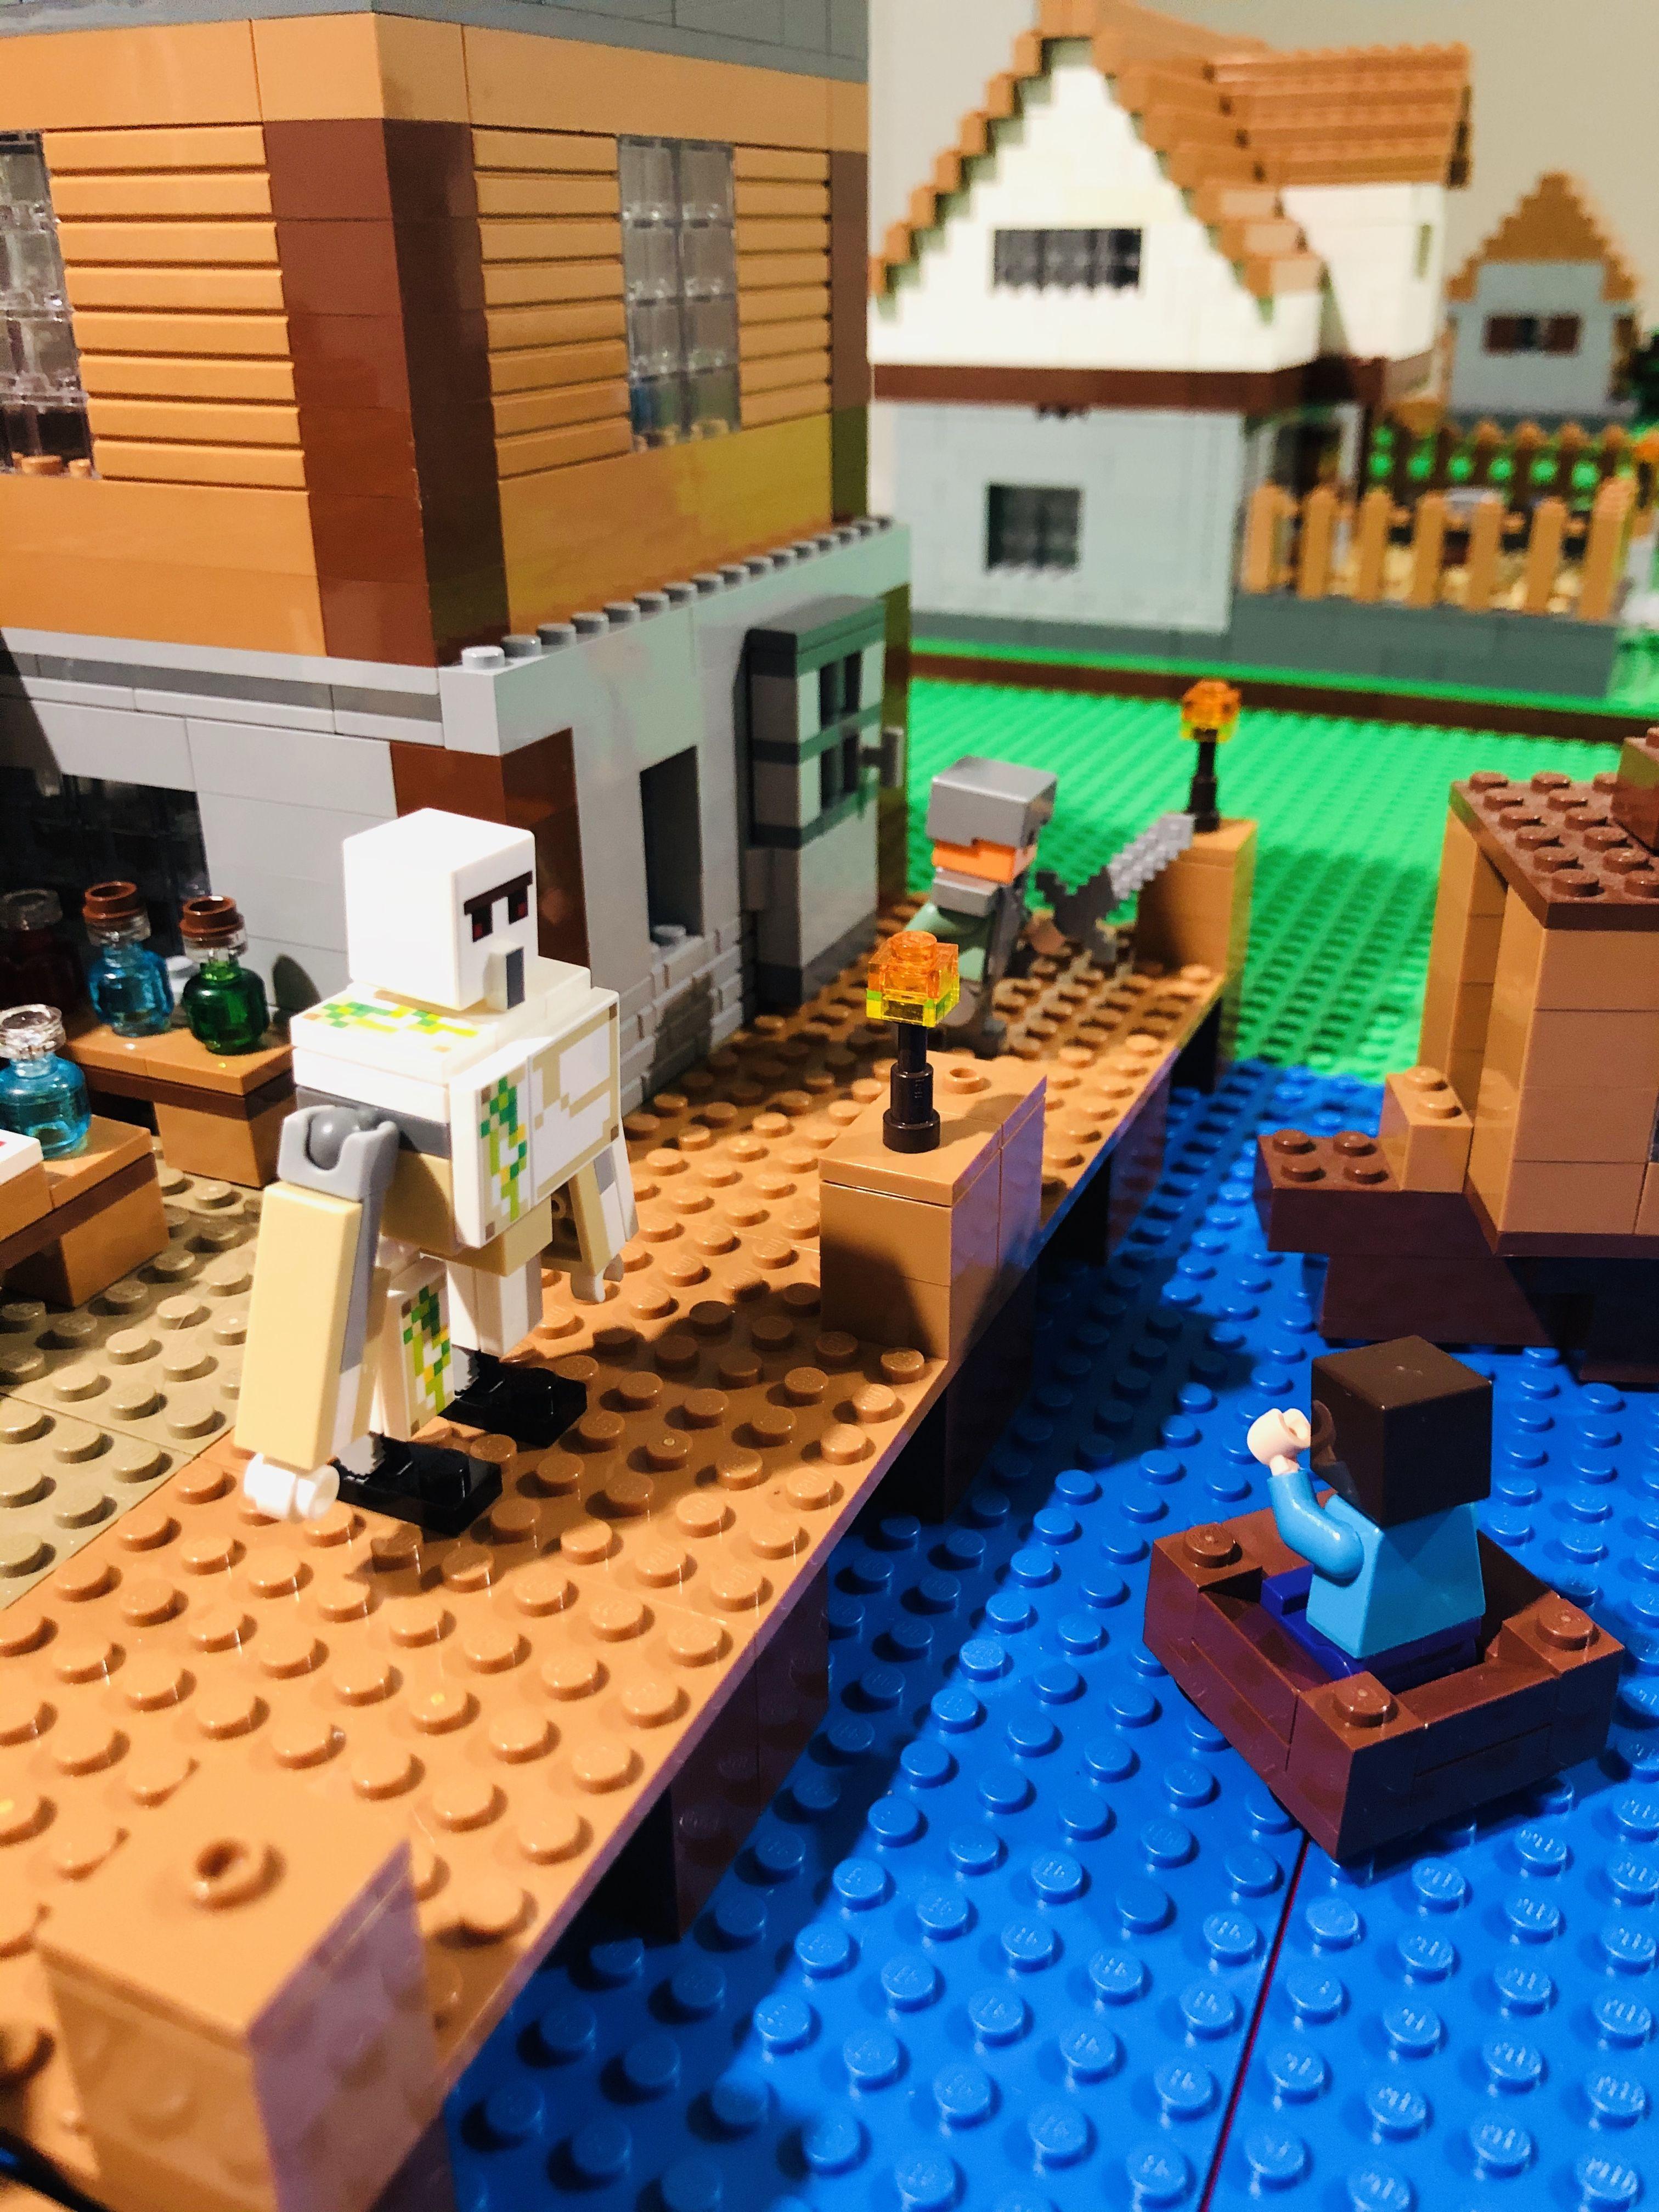 Pin By Lisa Valencia On Minecraft In 2020 Minecraft Creations Lego Minecraft Minecraft